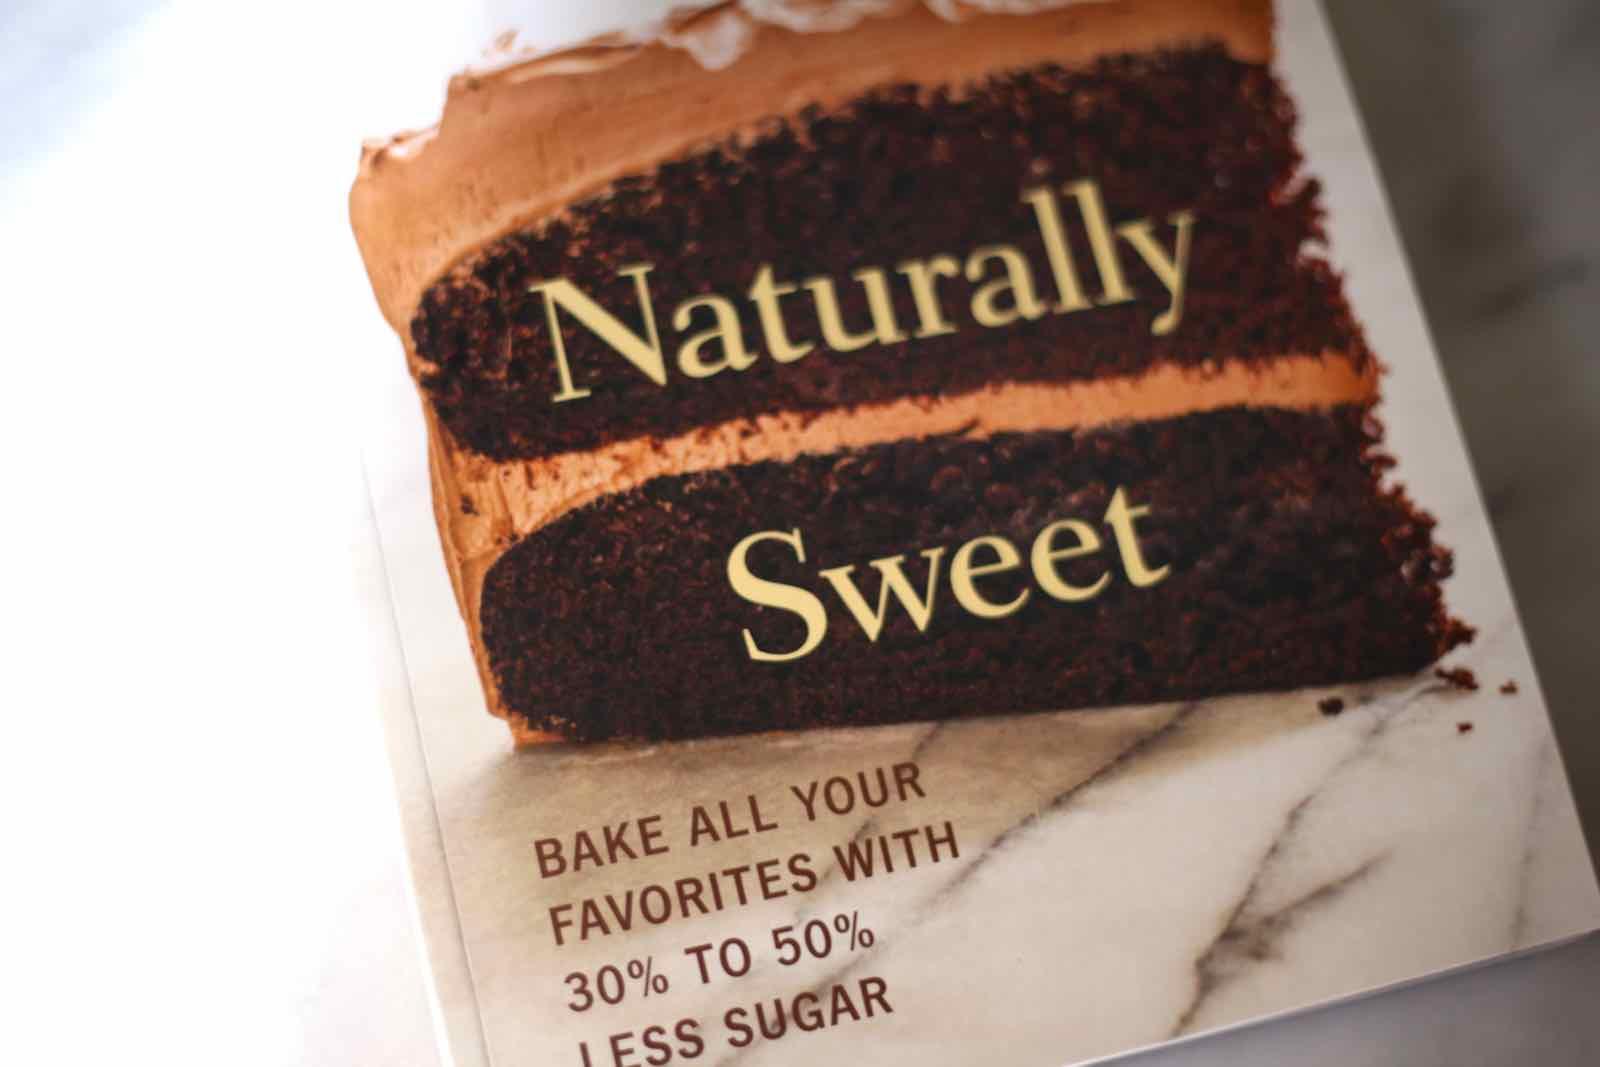 naturally-sweet-americas-test-kitchen-cookbook.jpg